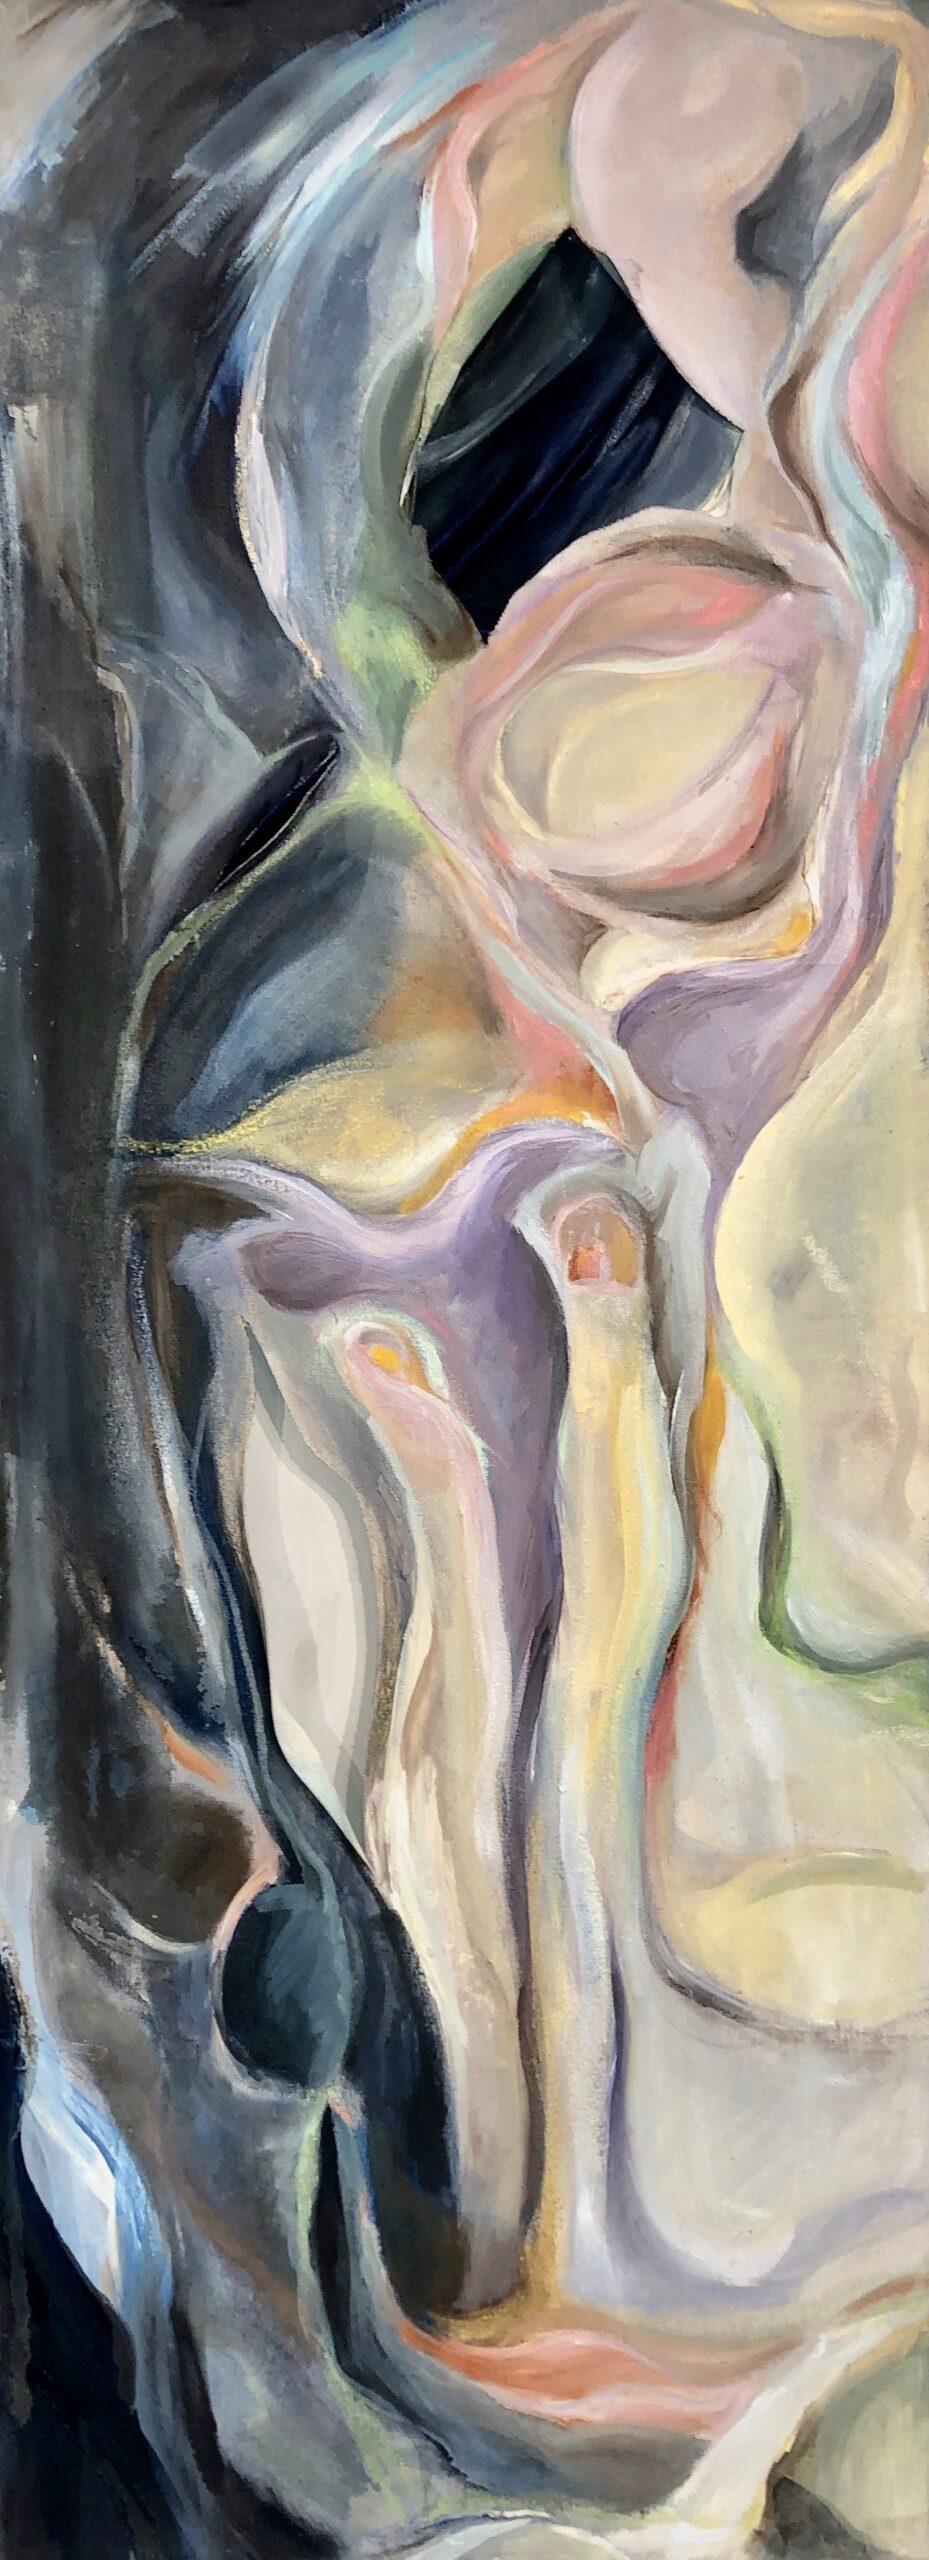 Thesis VII: Alchemy - by Elizabeth Bryan-Jacobs